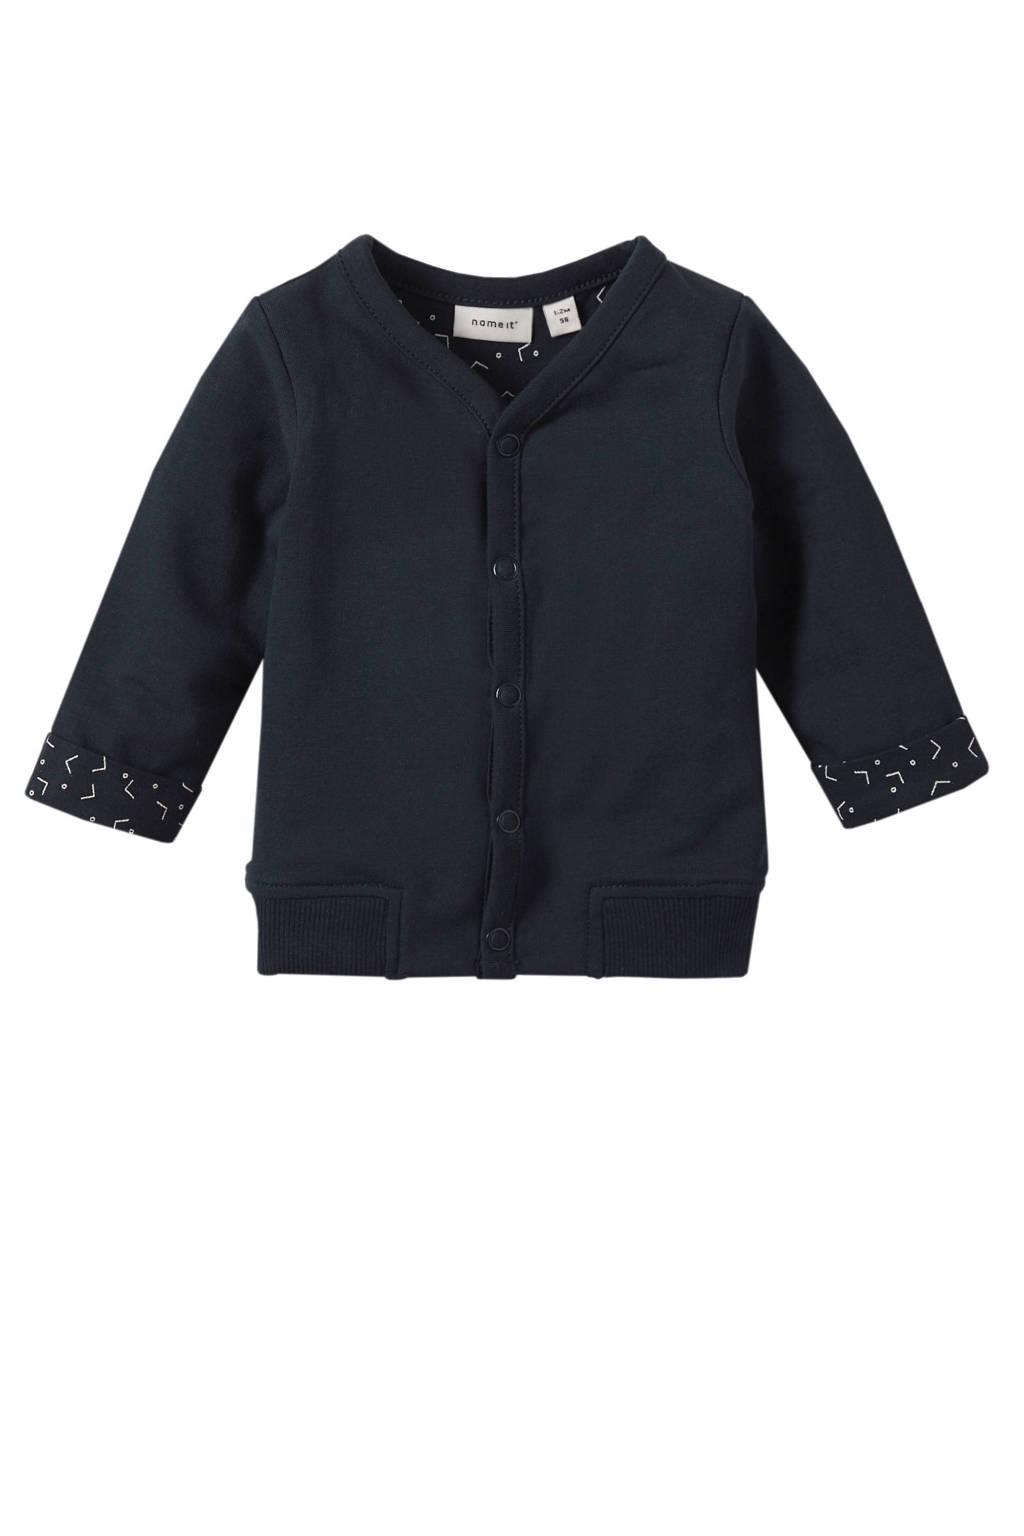 name it BABY newborn baby vest Delimo, Donkerblauw